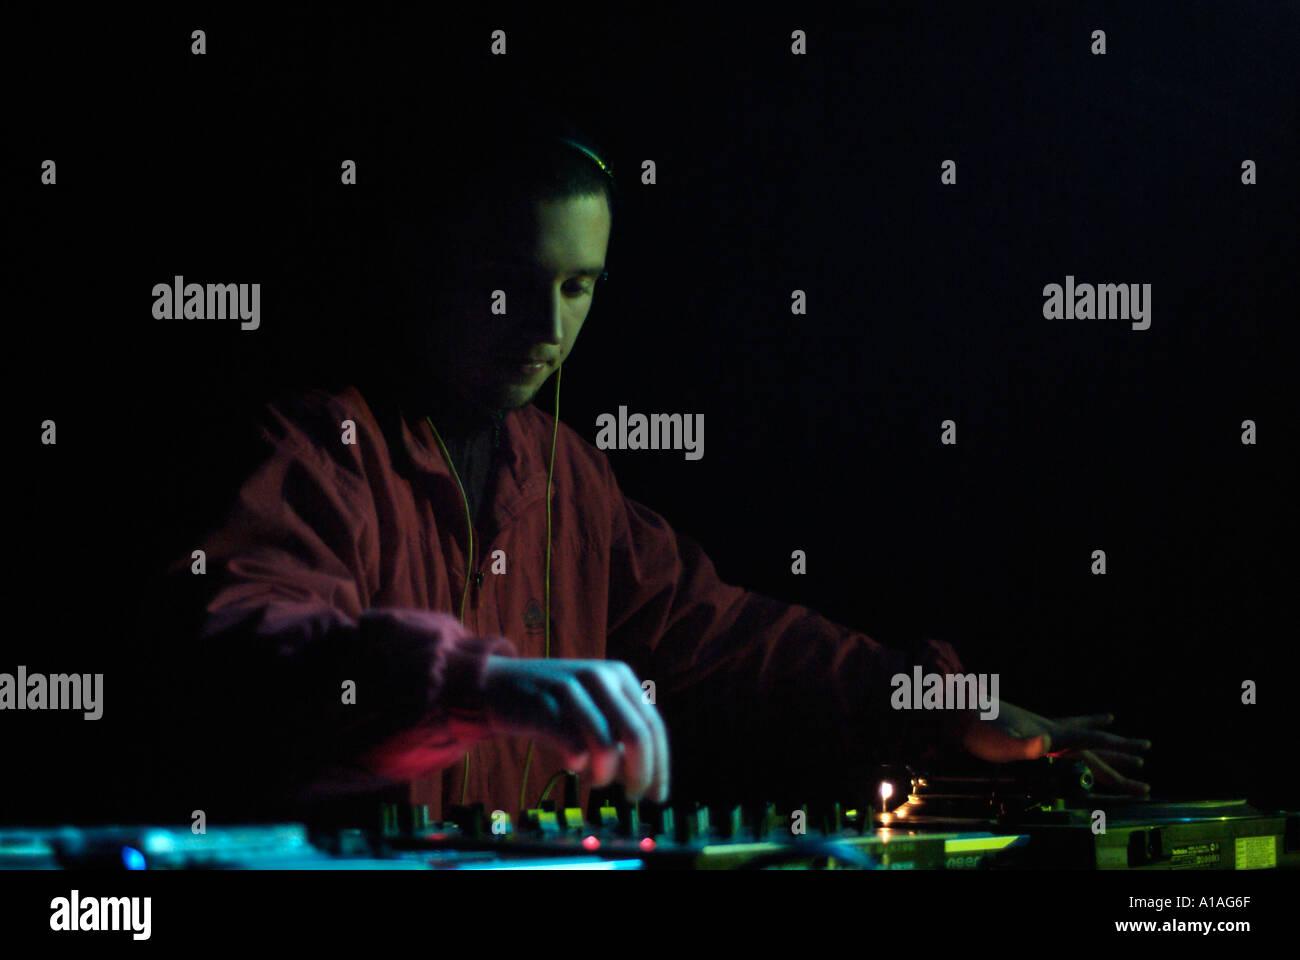 Club DJ Behind the Decks of a Nightclub - Stock Image